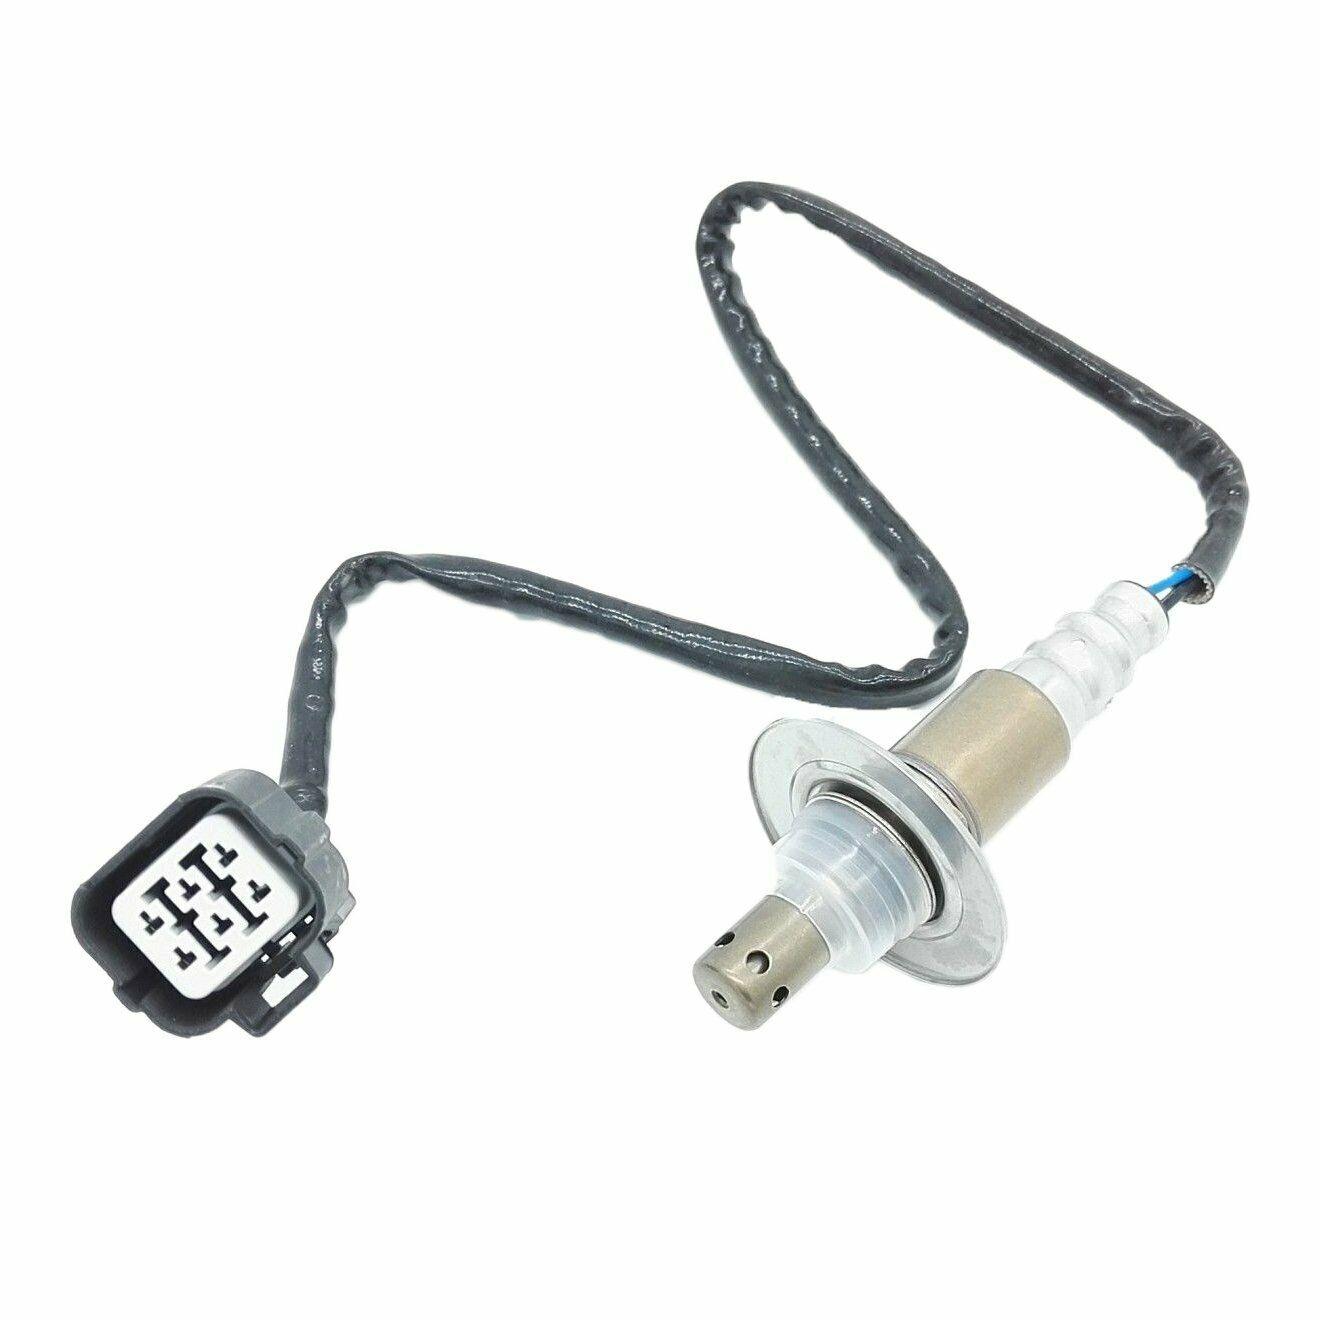 TIANBANG Upstream O2 Oxygen Sensor 234-9123 22641-AA36A 22641AA360 32010412 For Subaru Impreza Forester Outback Legacy L4-2.5L